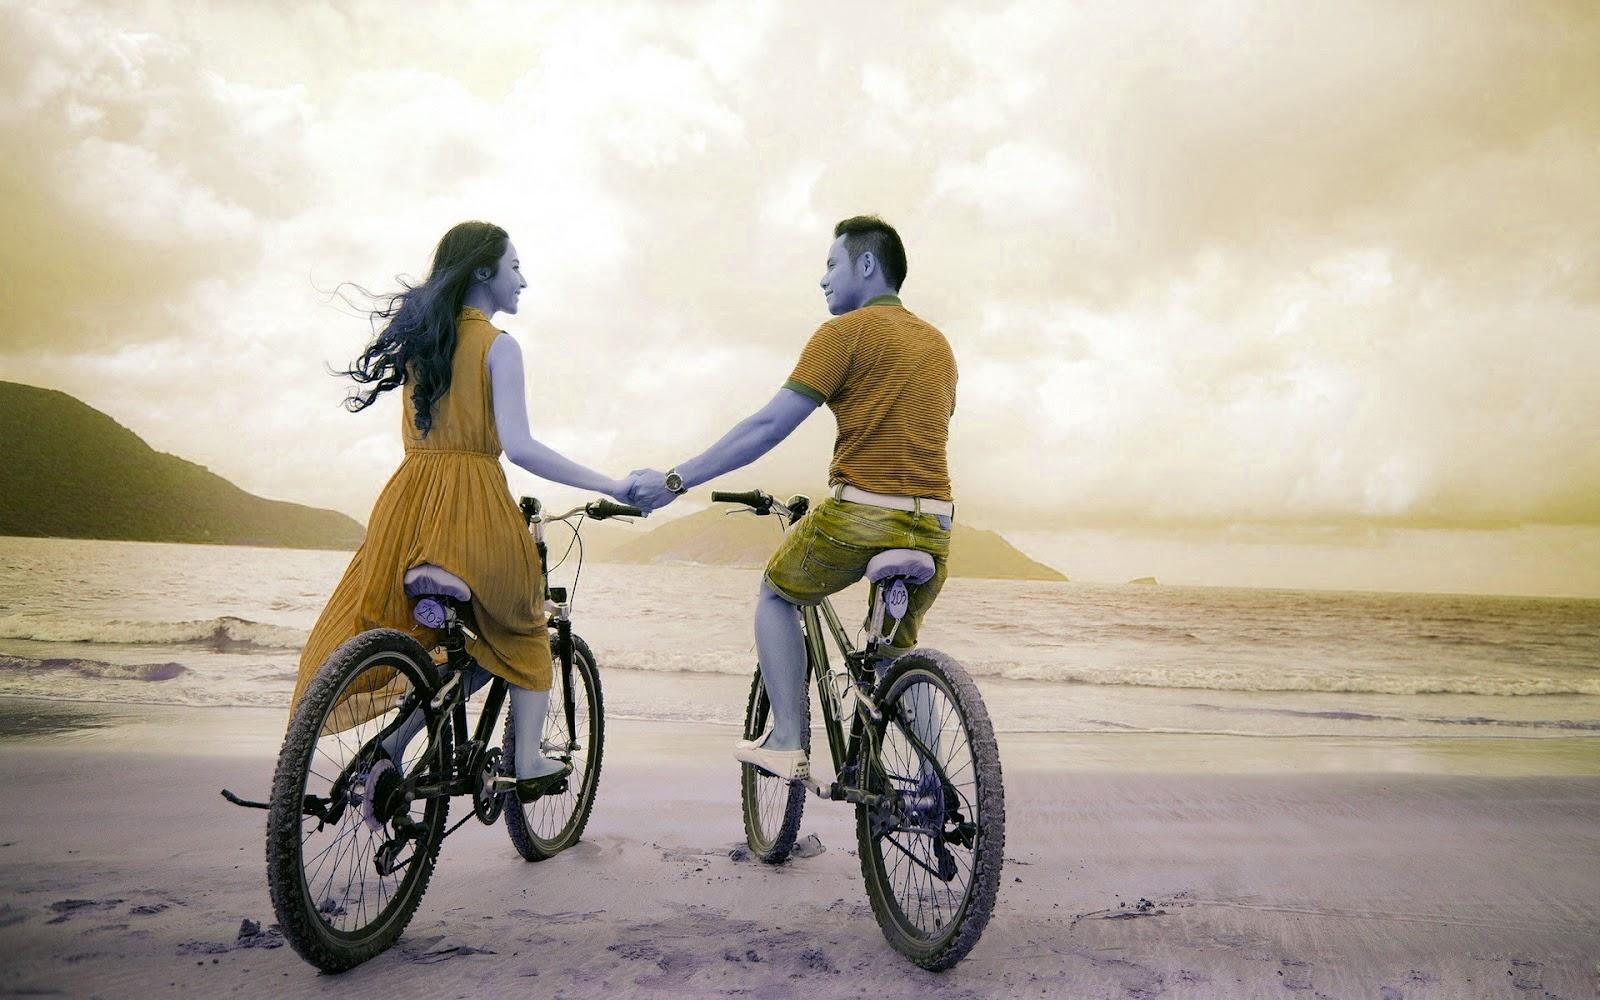 Beautiful Romantic Coupal 1080p HD Wallpaper & Images